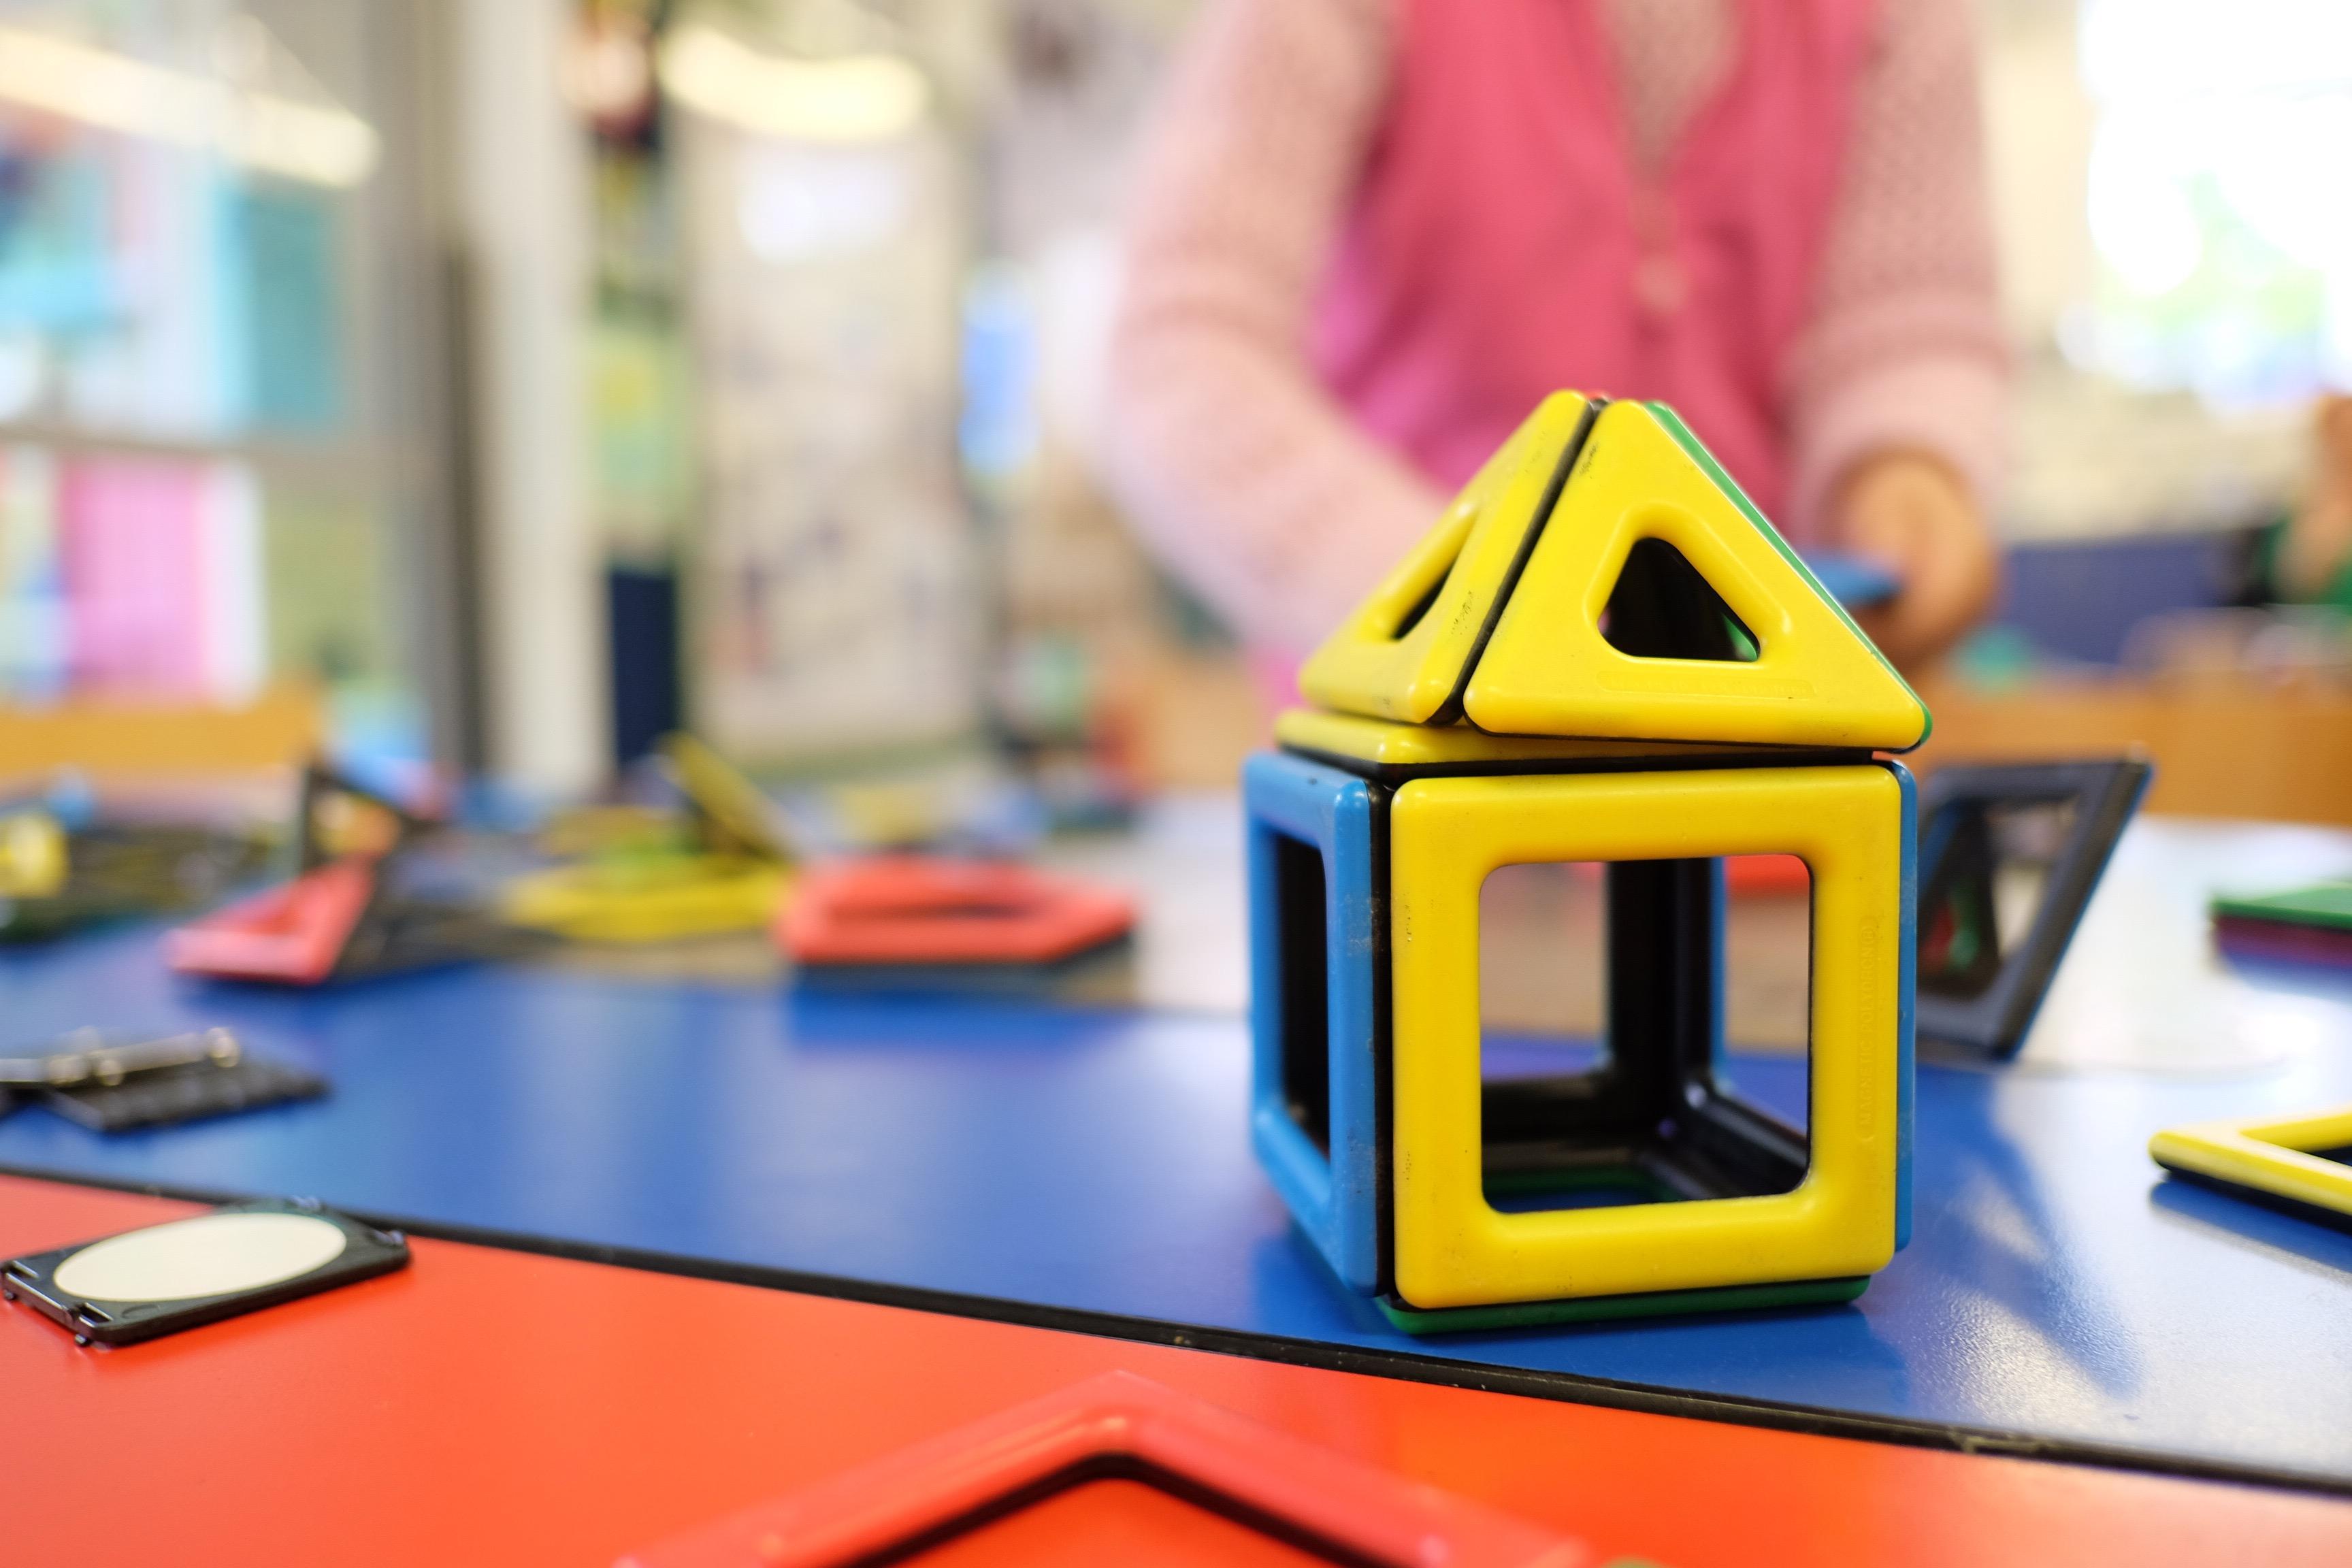 Childcare centre house building blocks table